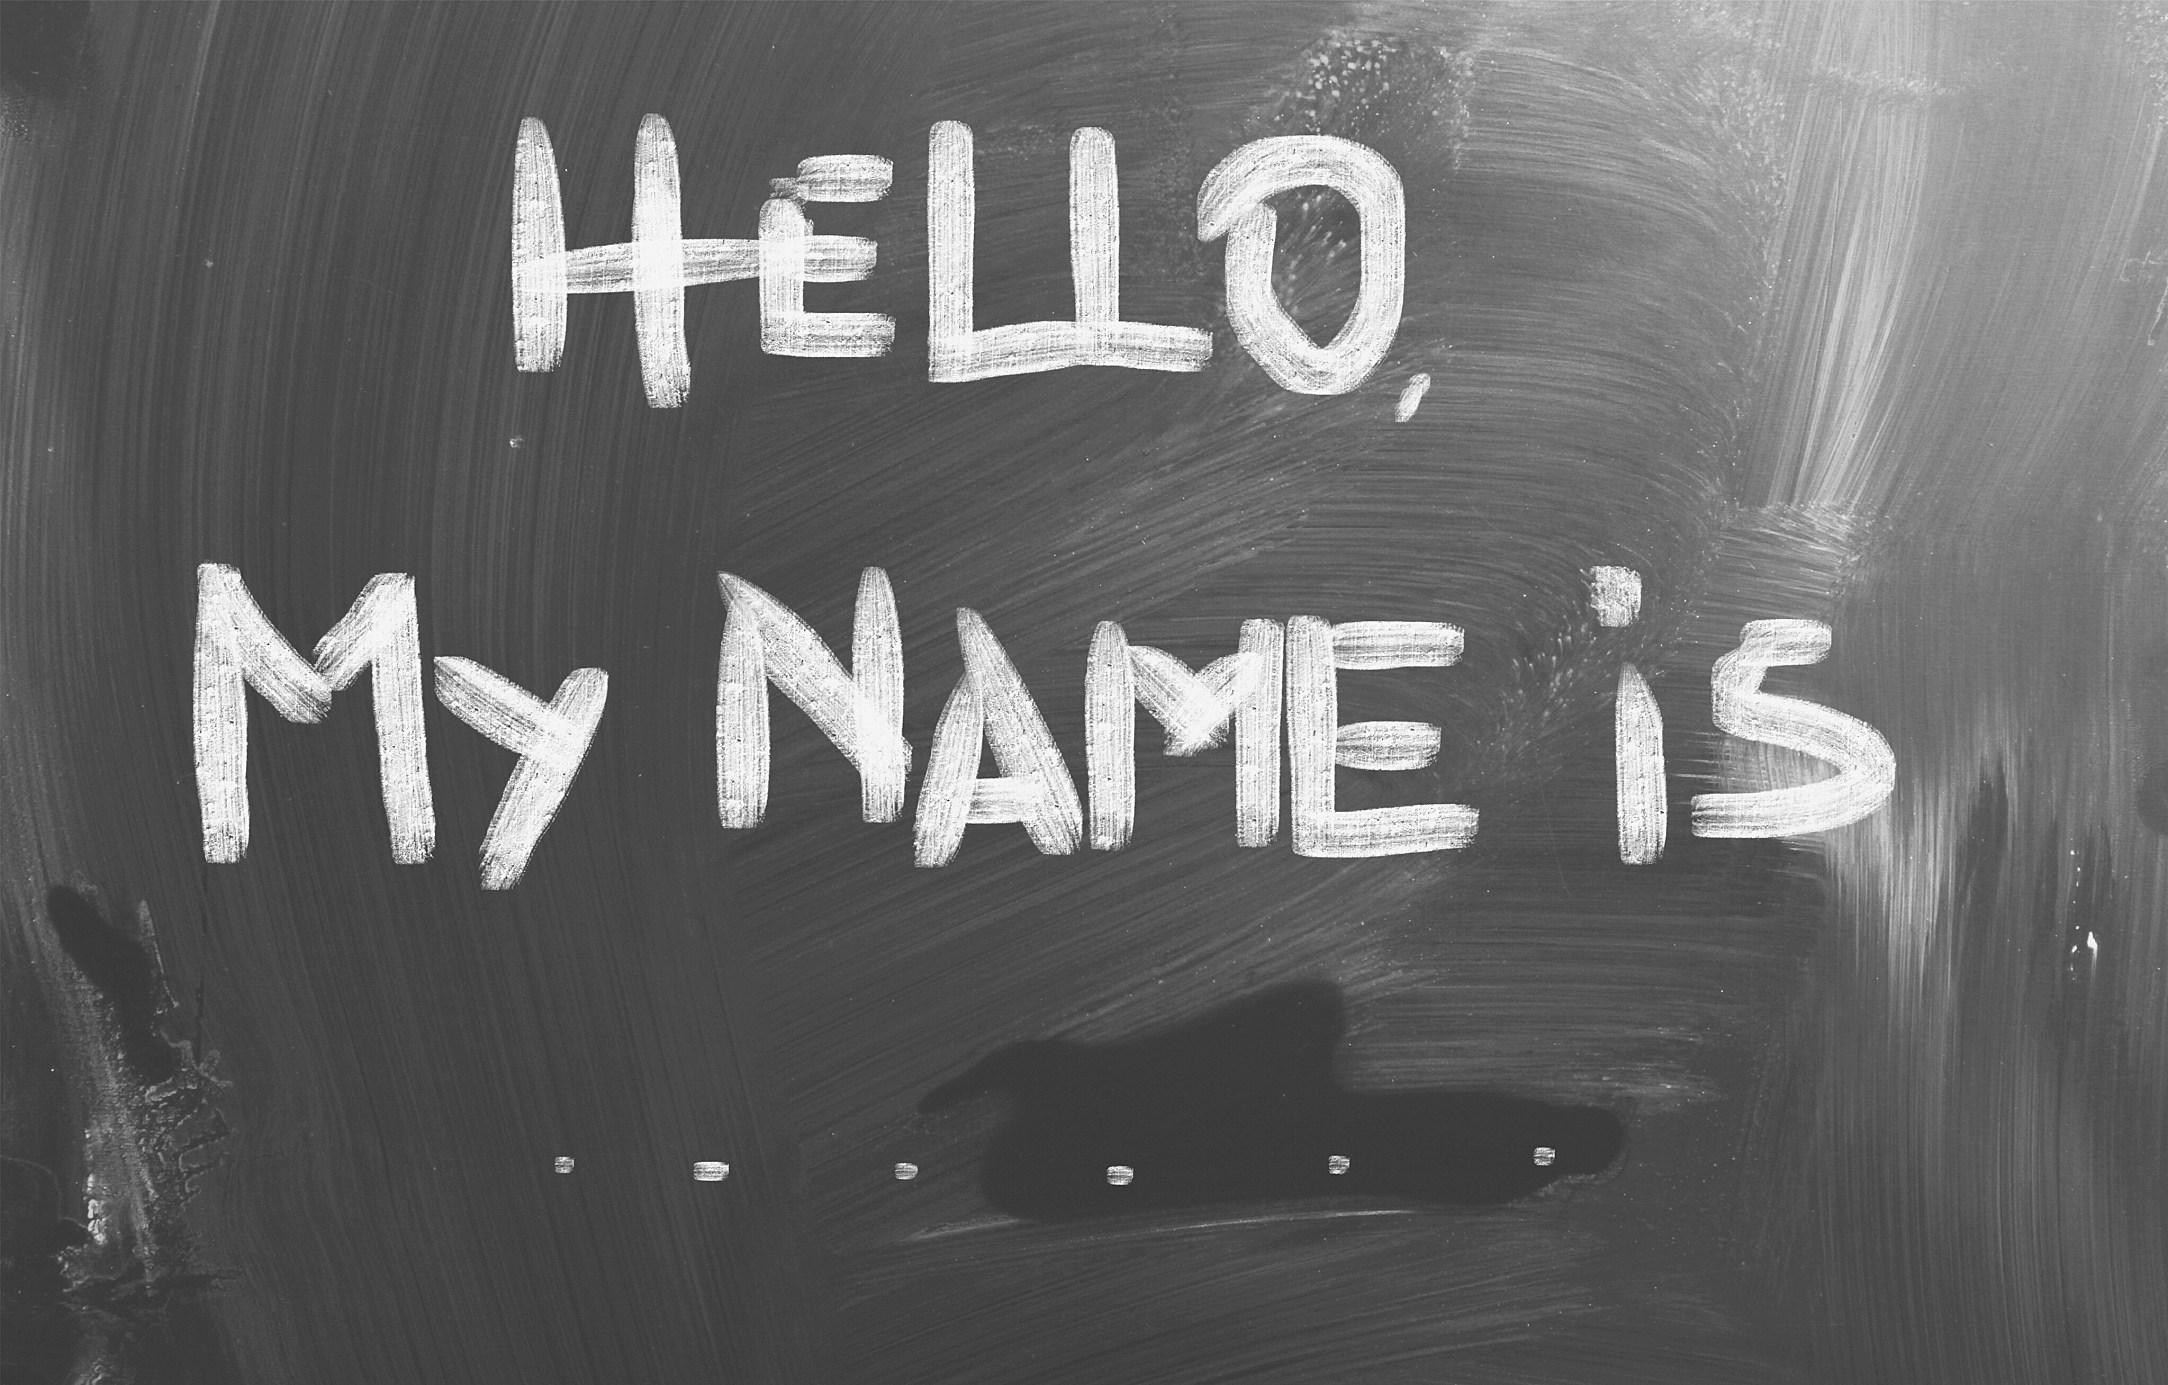 6ba11aa40f8fda These Are The Most Common Last Names In Michigan